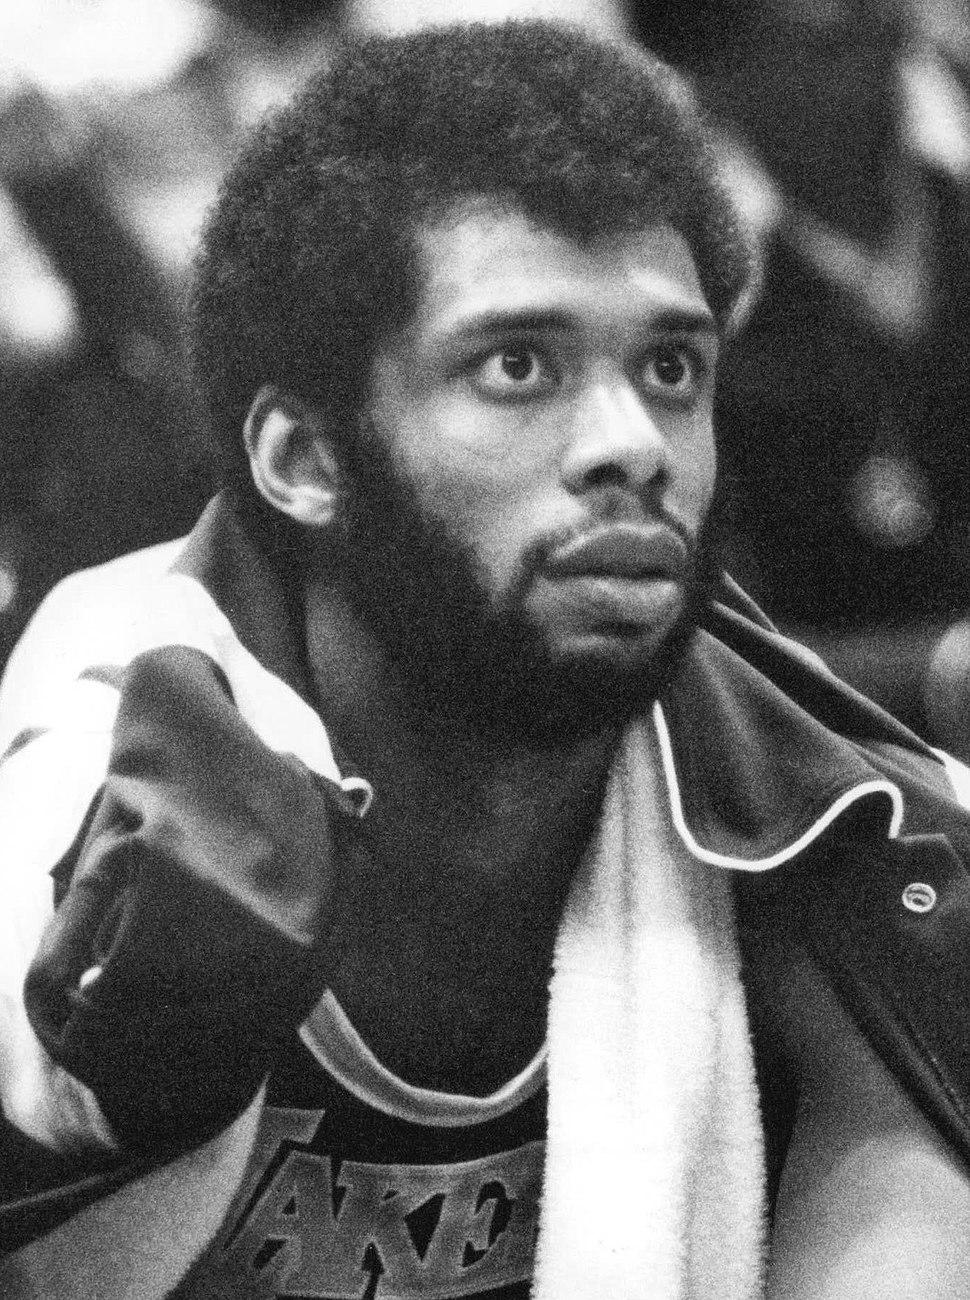 Kareem Abdul-Jabbar 1975.jpeg